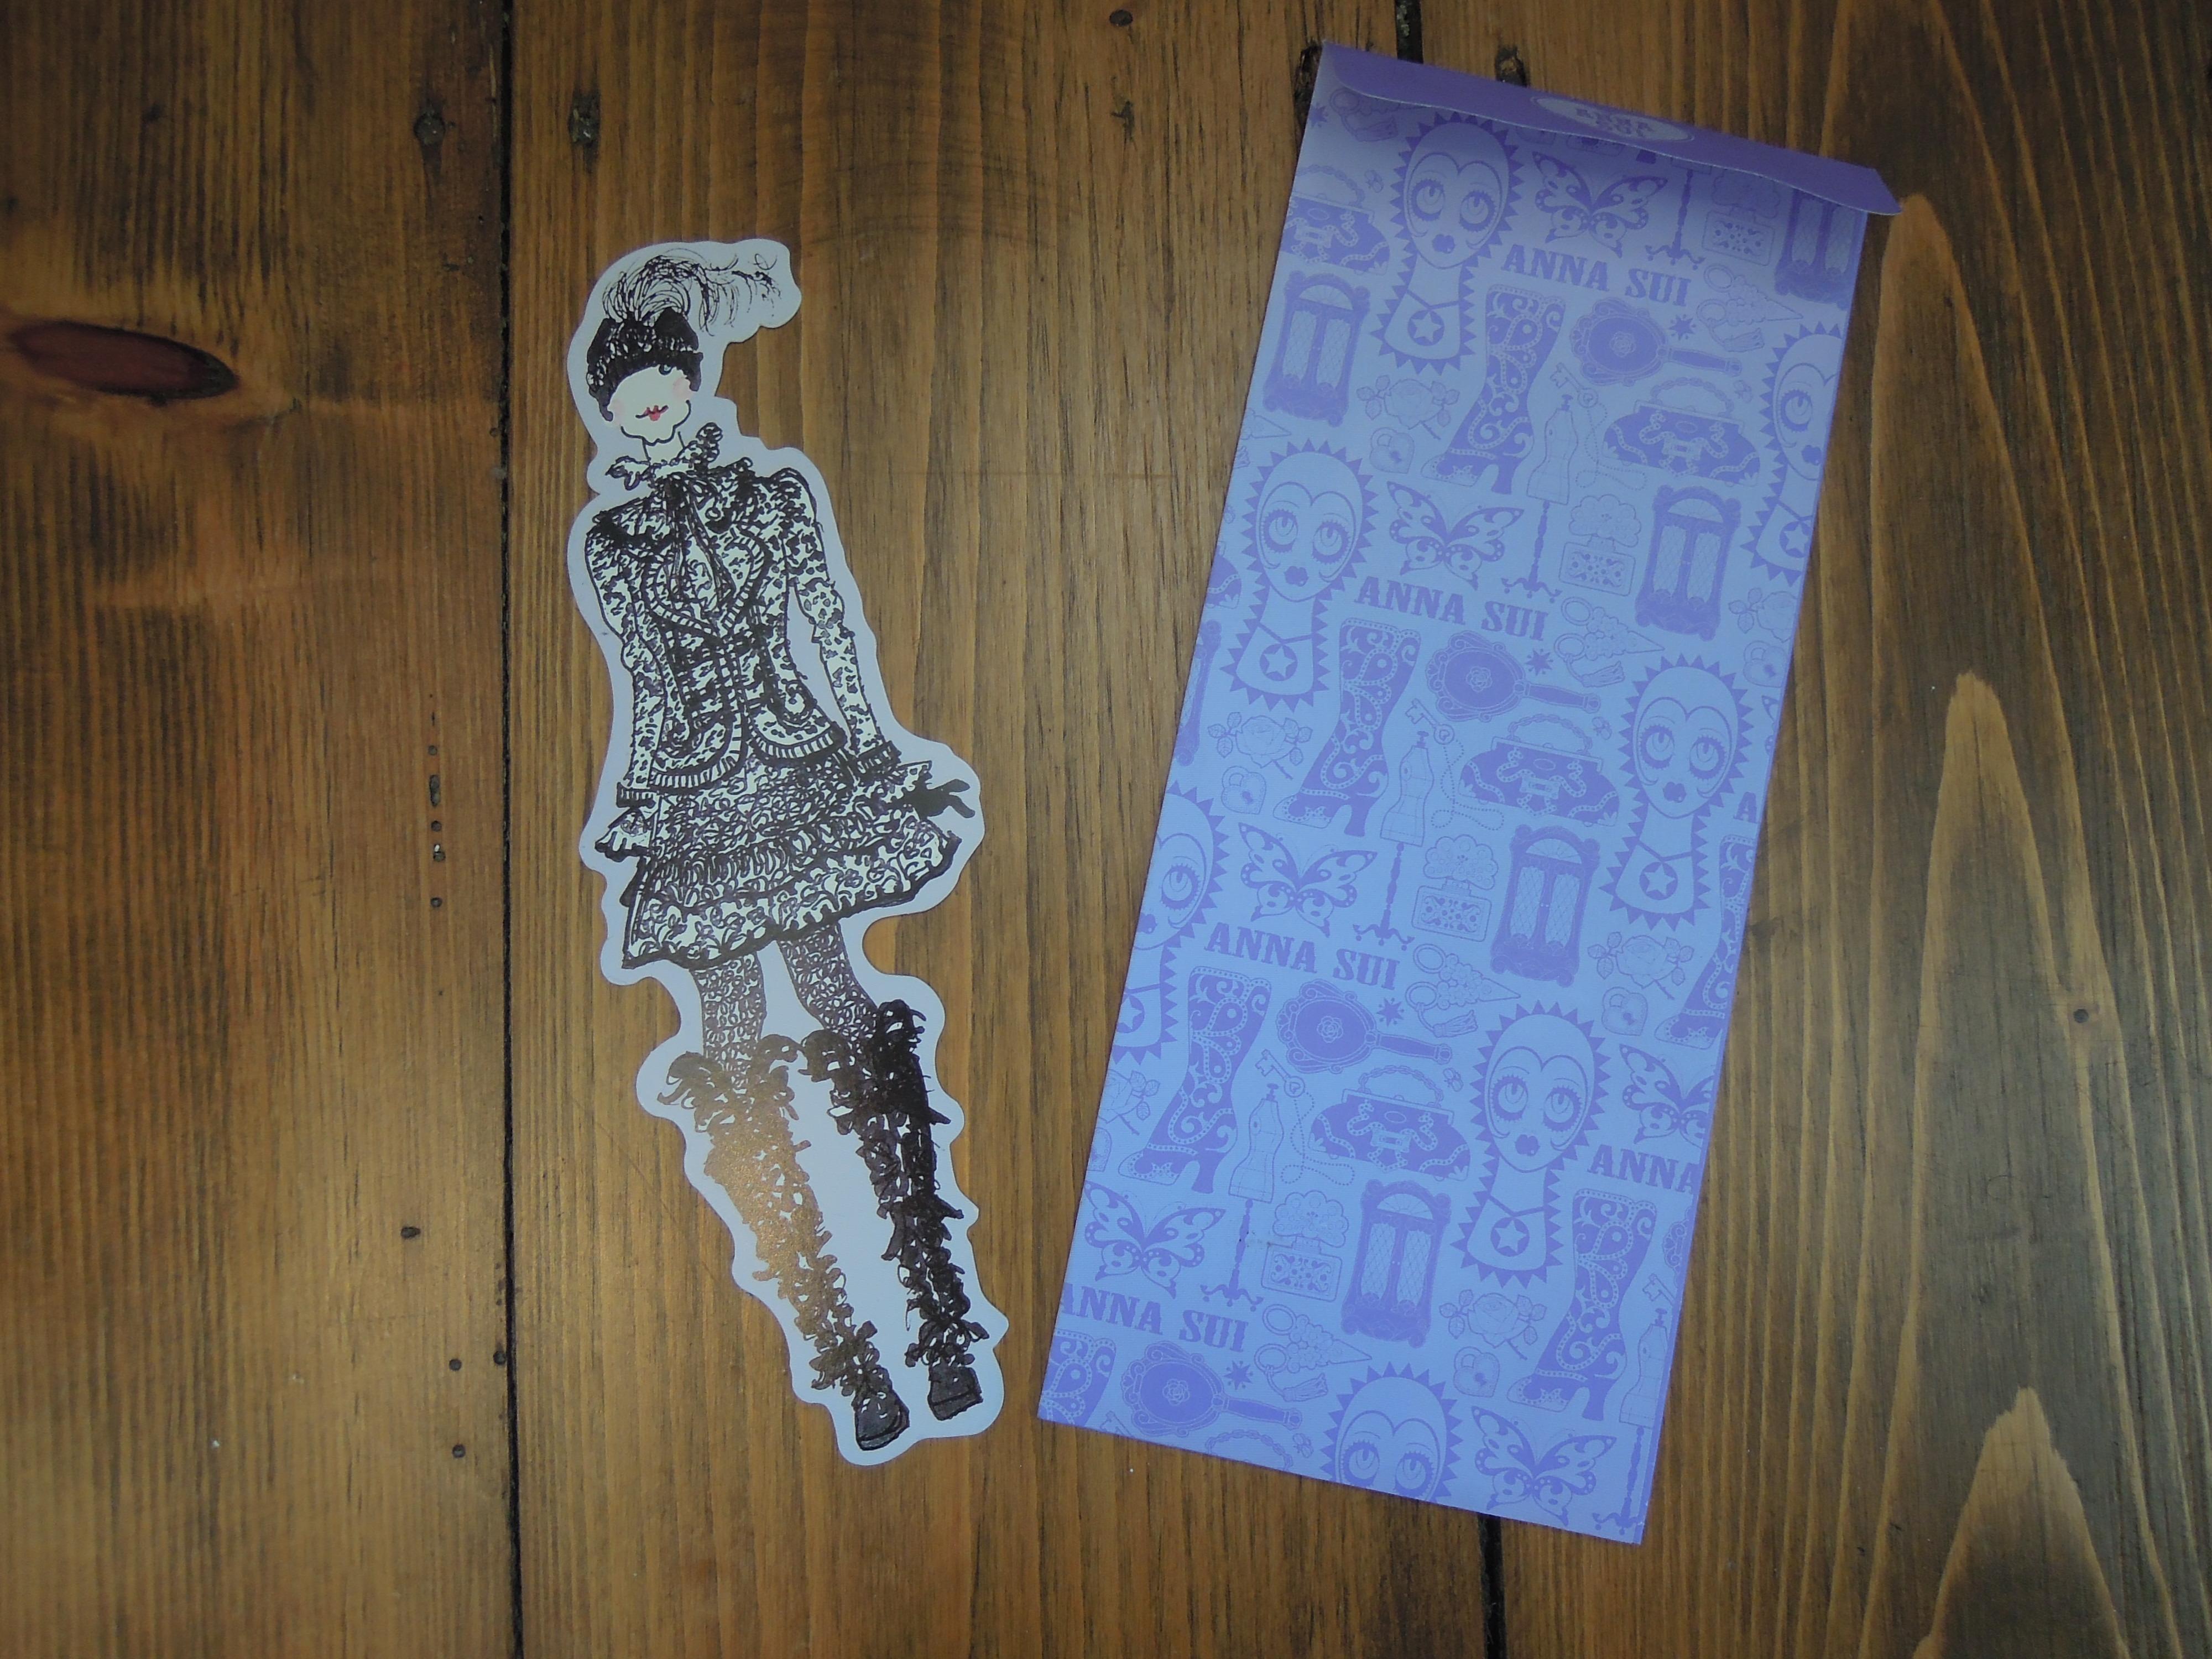 Anna Sui card